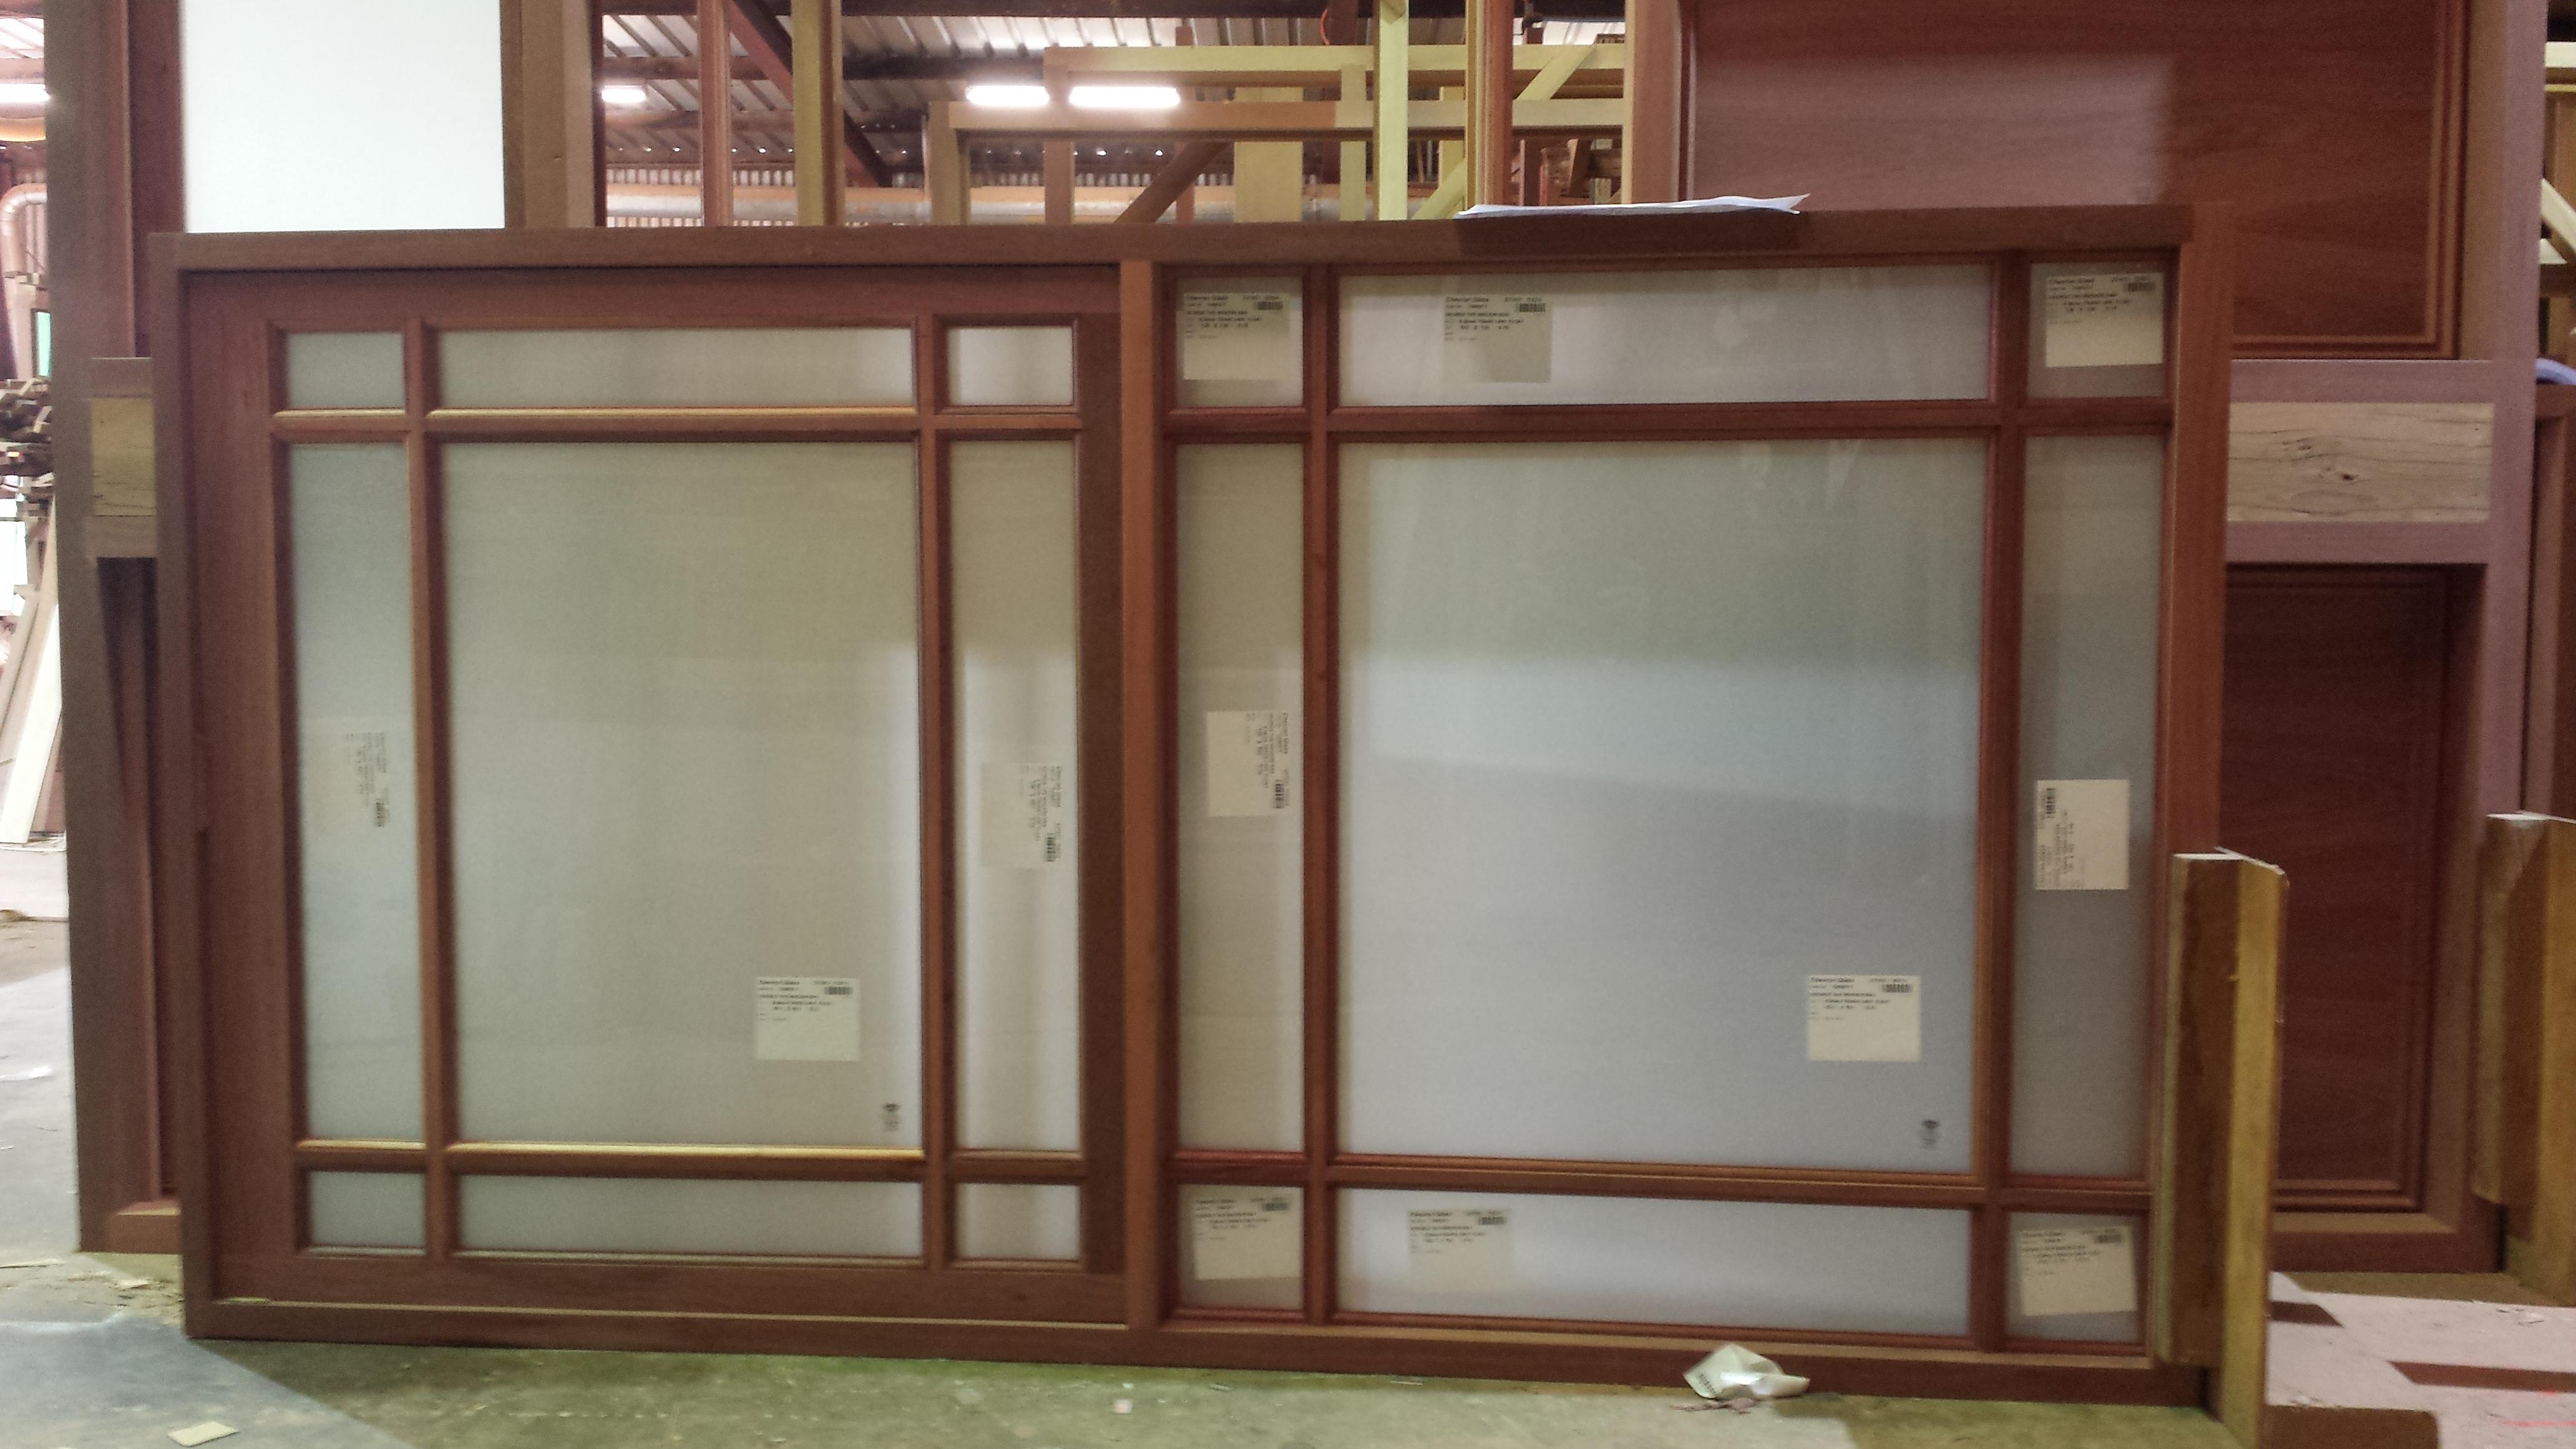 20150728_152404 & Jarrah Window u2013 THE WINDOW MAN pezcame.com